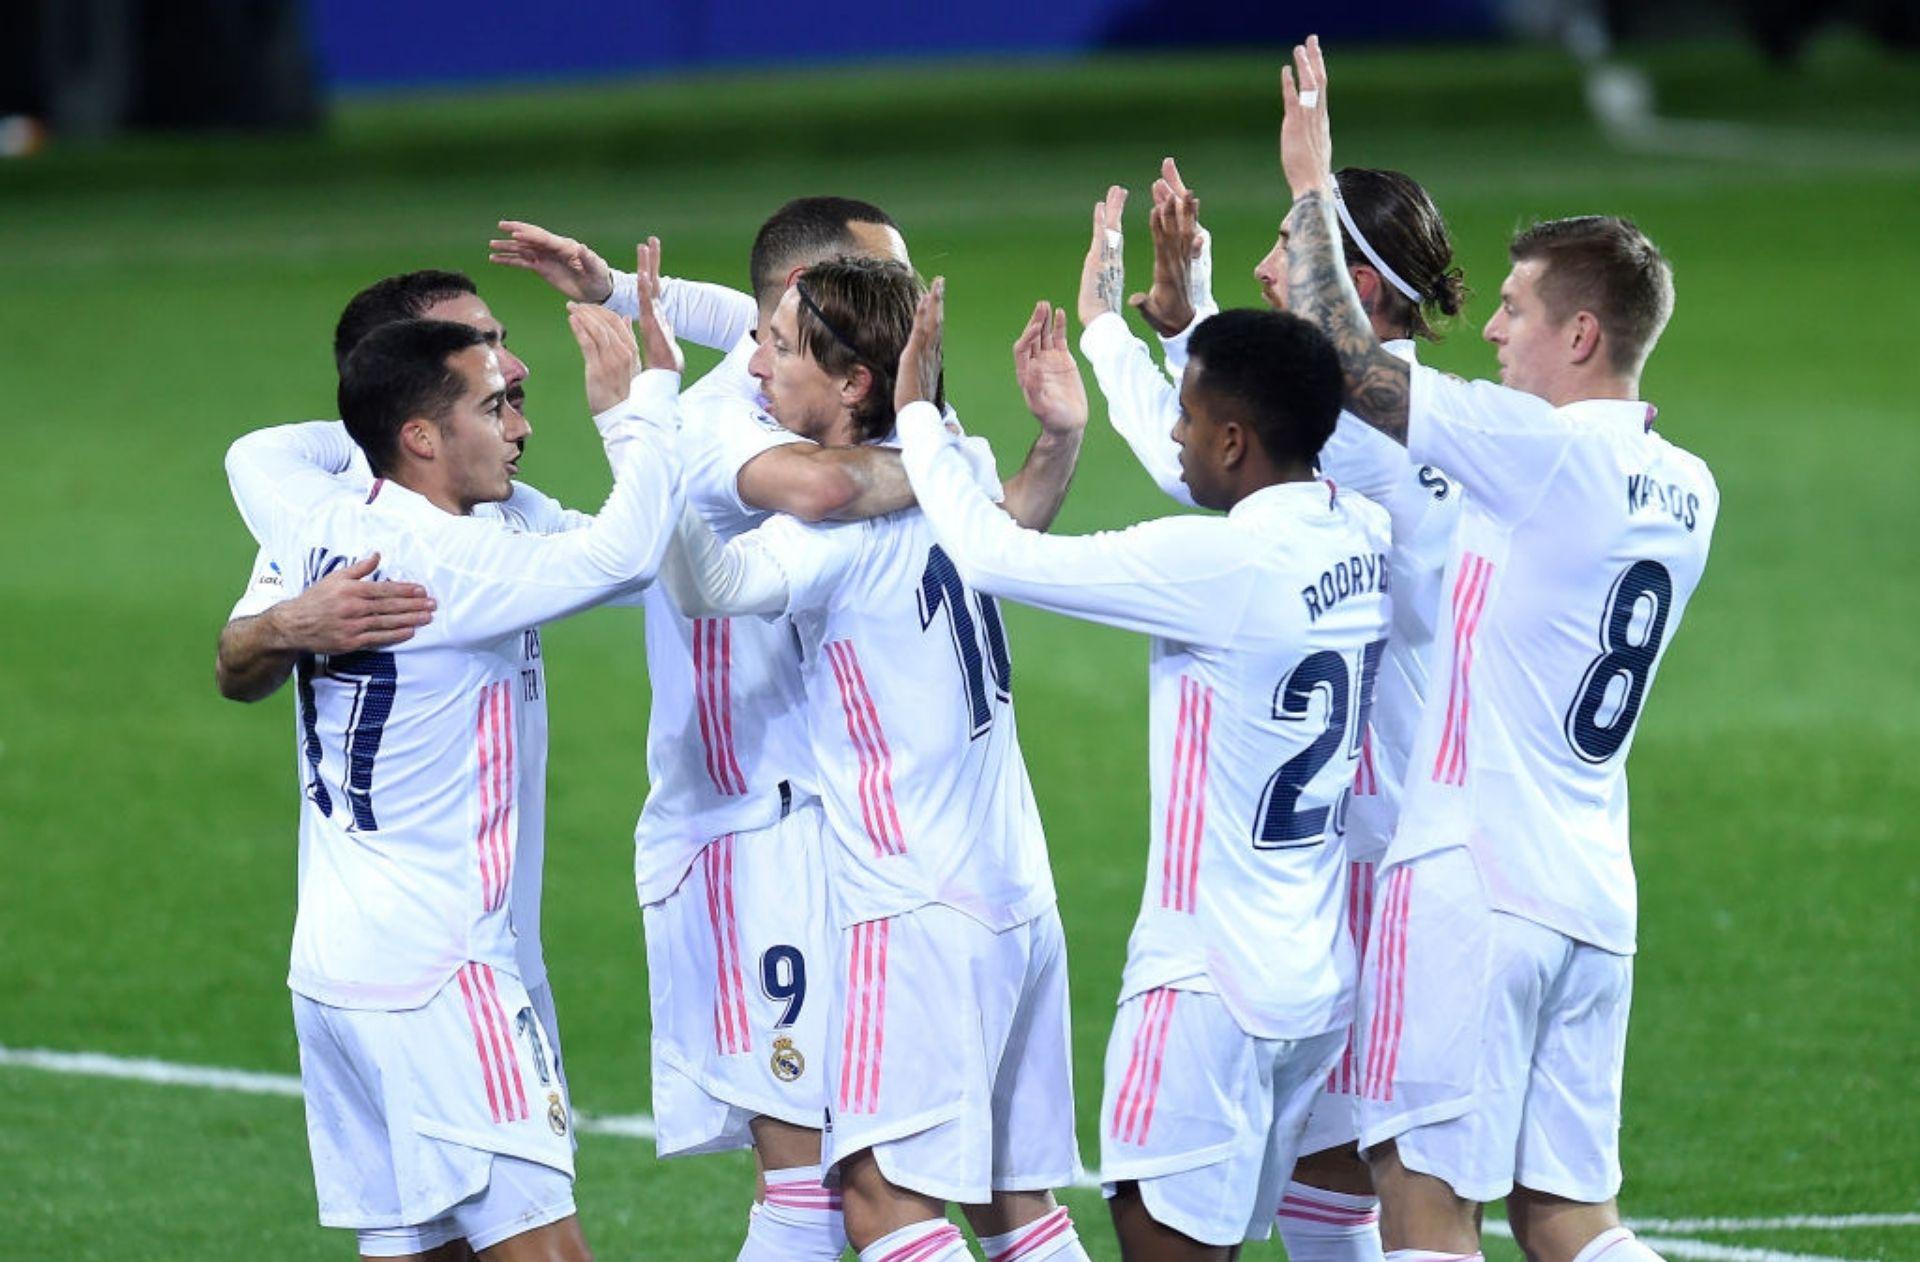 Osasuna vs Real Madrid: Preview, Betting Tips, Stats & Prediction